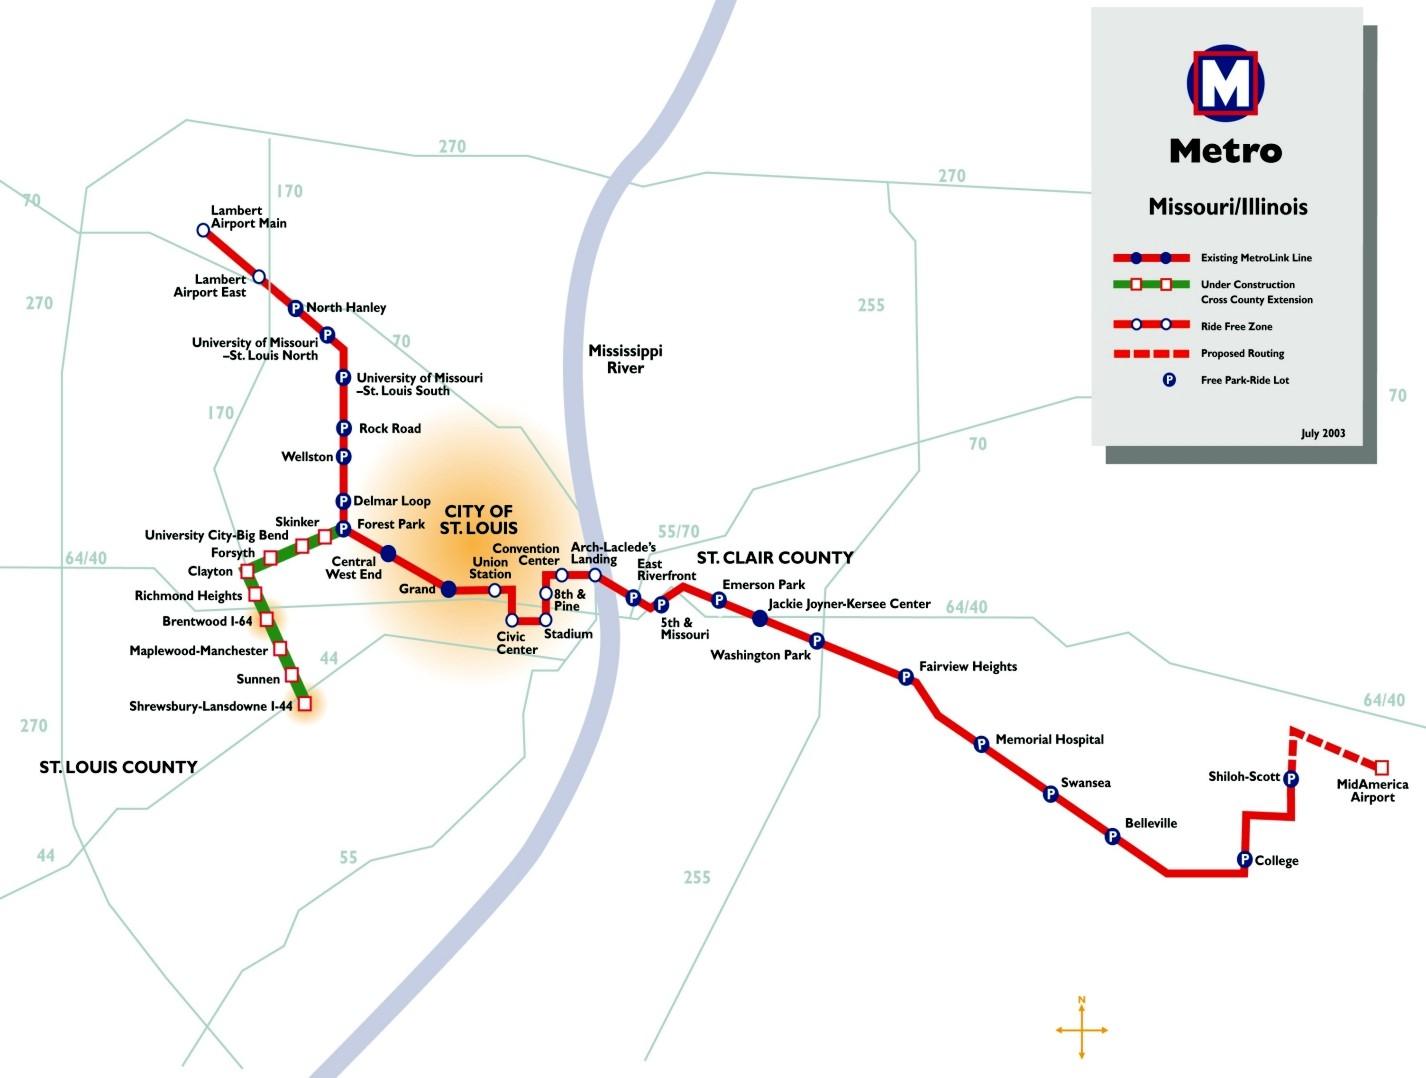 St Louis MetroLink CrossCounty light rail Nashville commuter rail